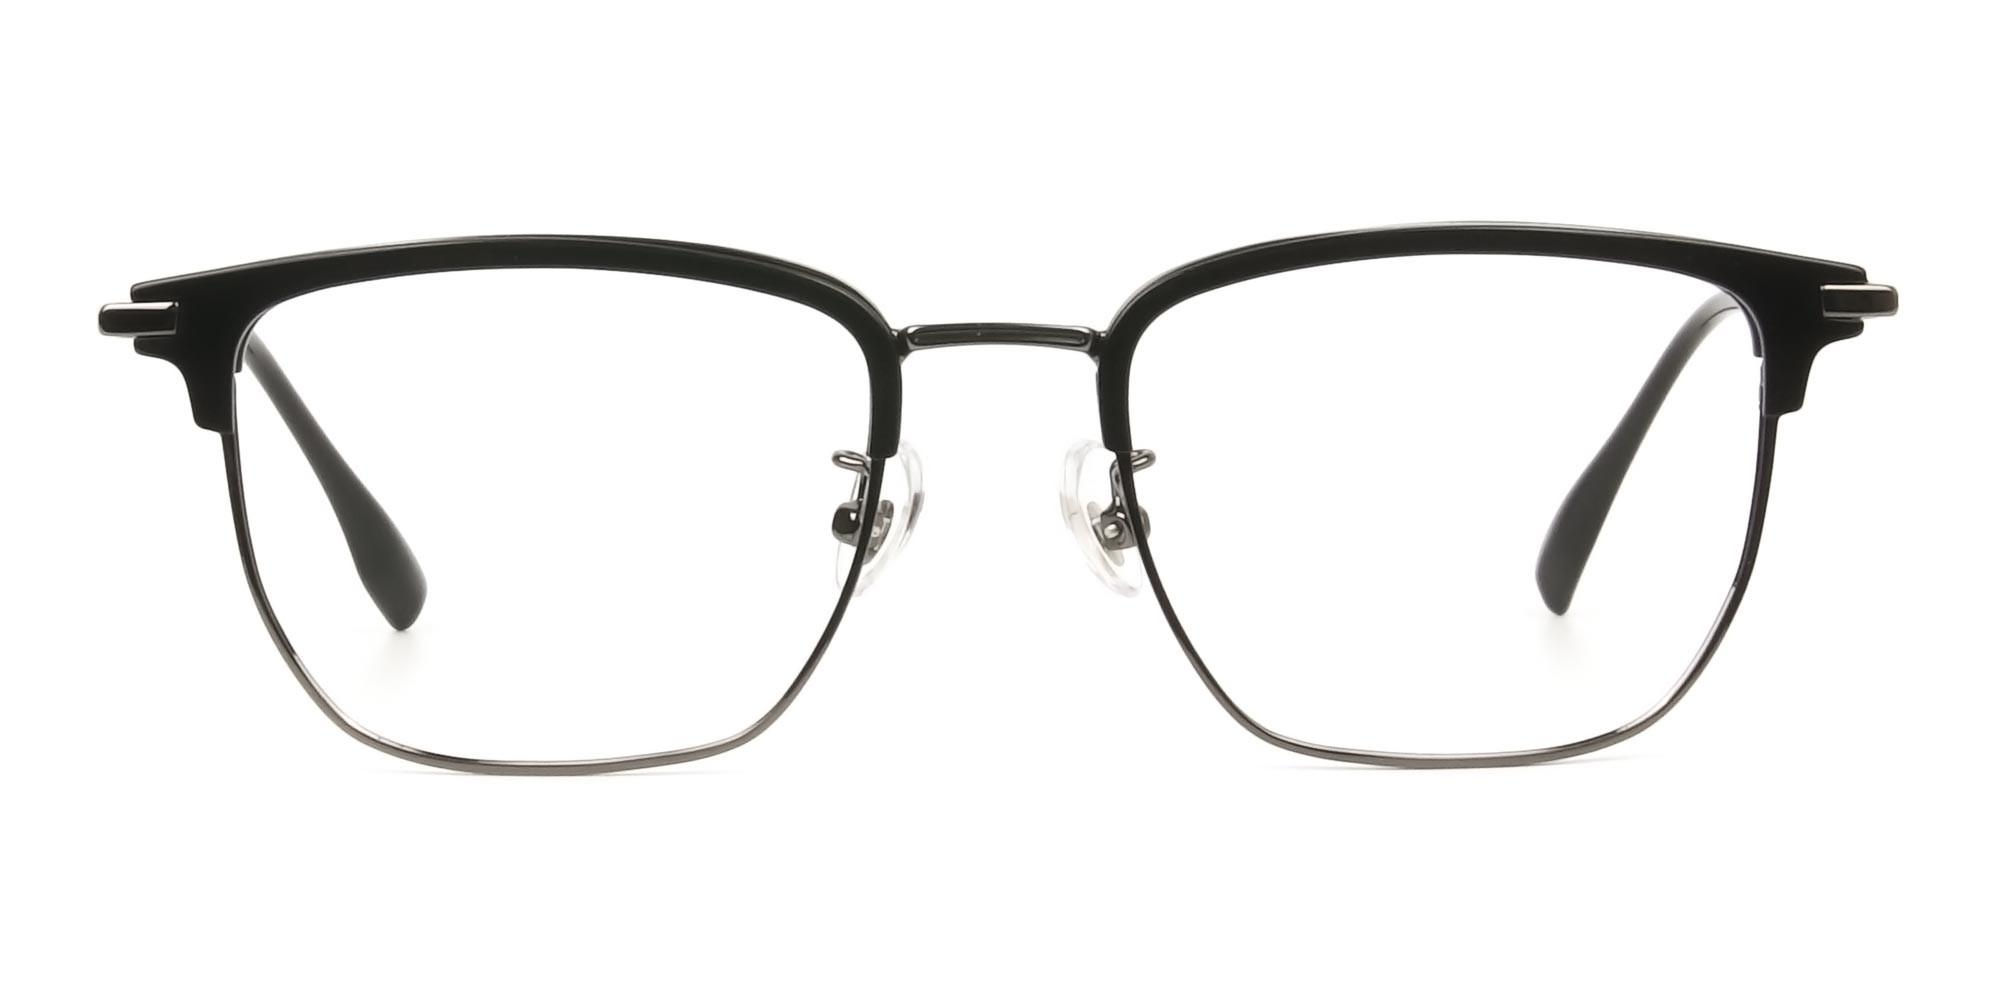 Wayfarer Browline Black & Gunmetal Large Frame Glasses - 1